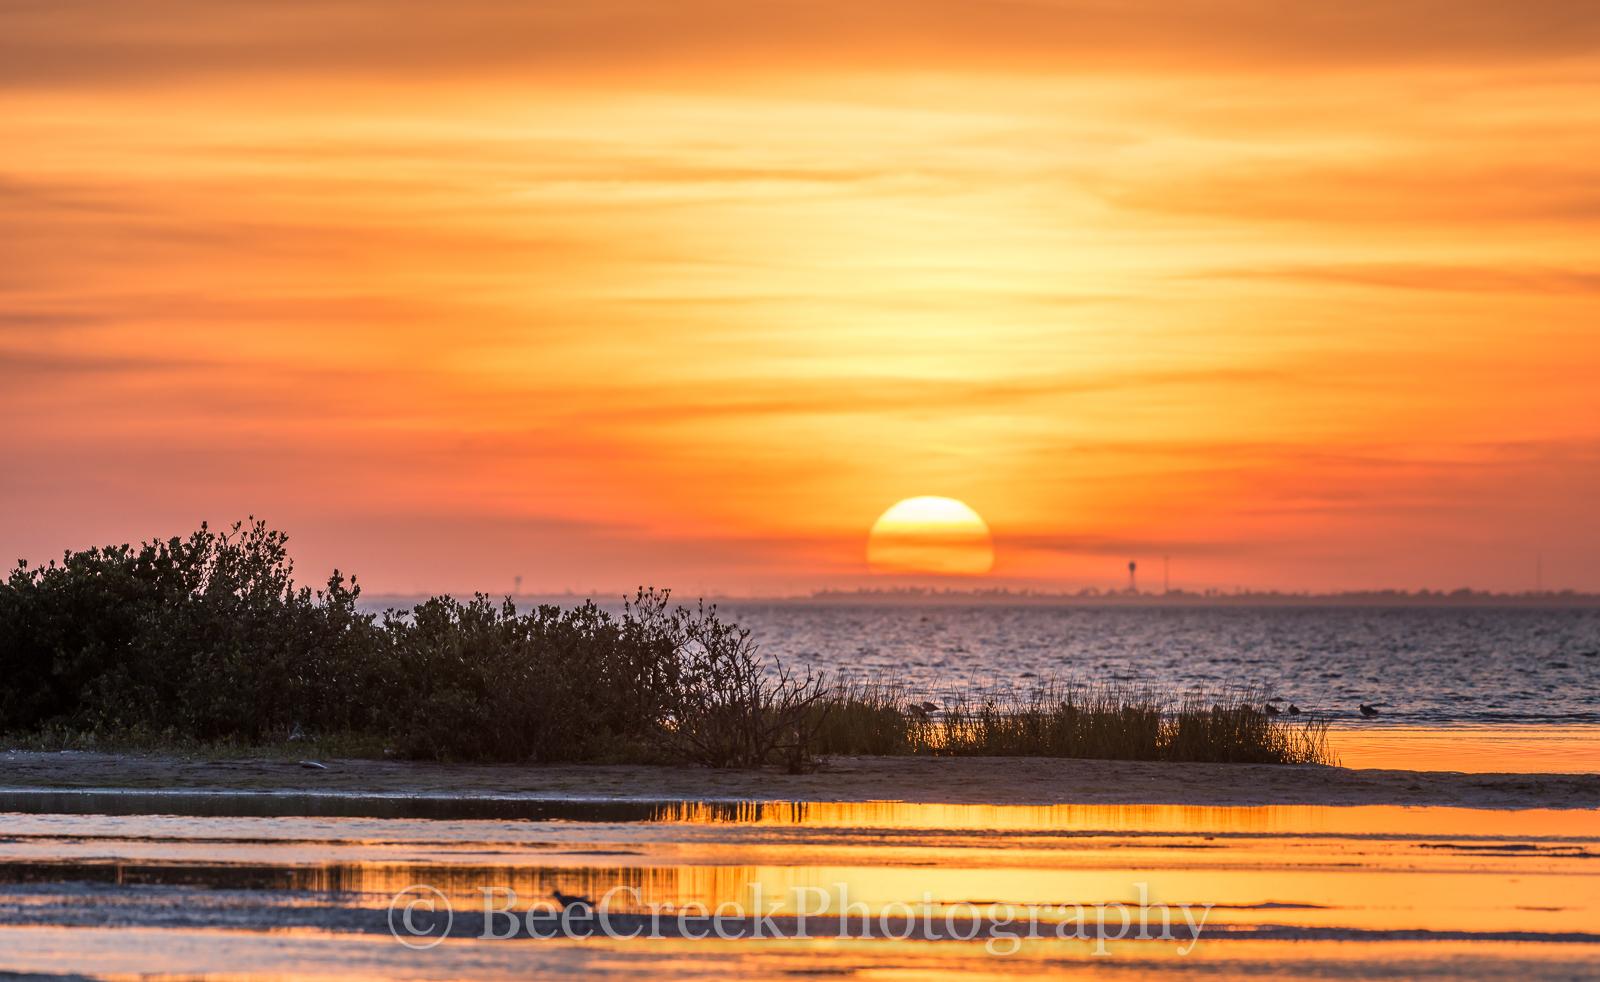 South Padre Island, Sunset, landscape,  Laguna Madre, Sunset over south padre island, bay, beach, coast, coastal landscapes, coastal plains, dunes, images of South Padre, island, photos of South Padre, photo